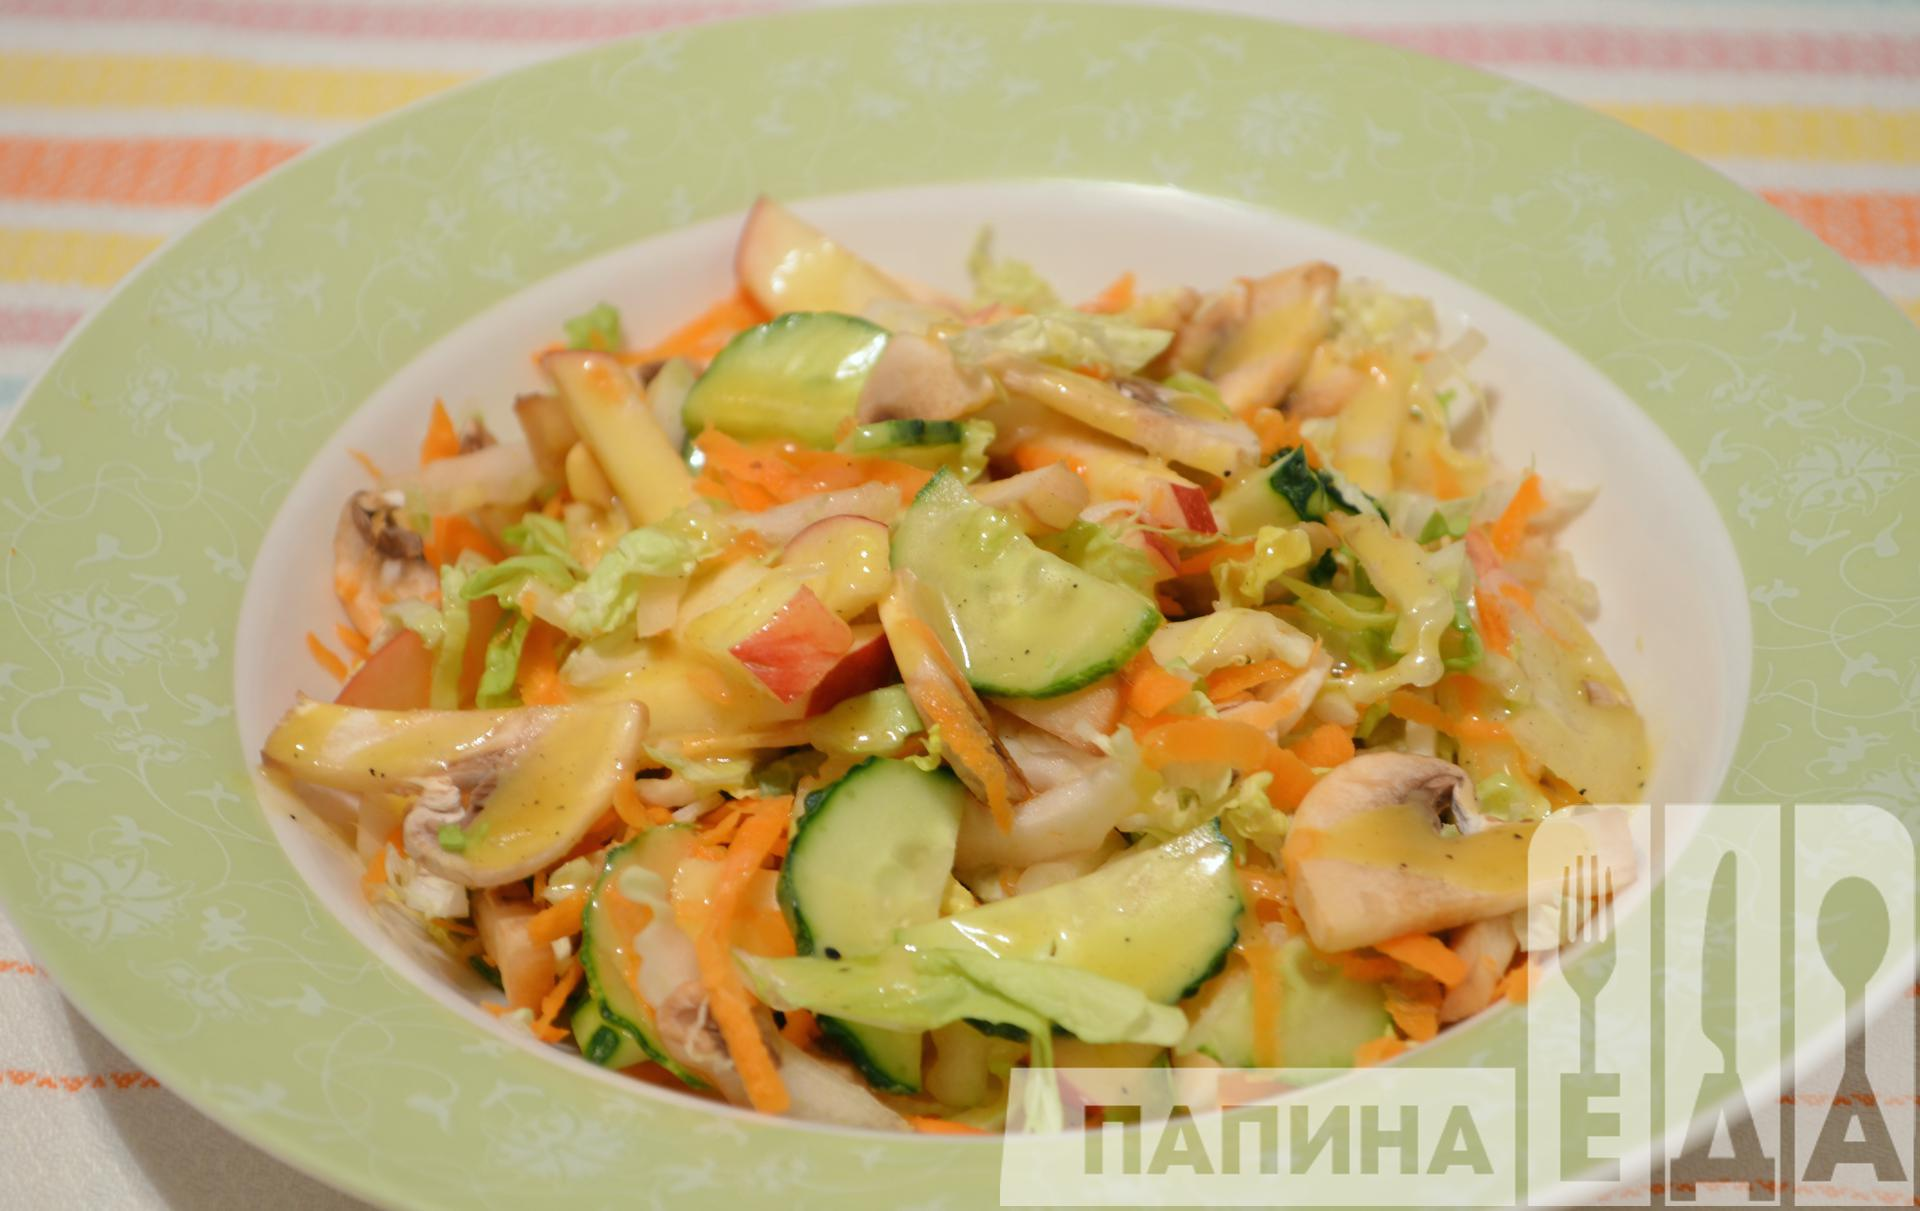 Вкусный салат без майонеза пошаговый рецепт с